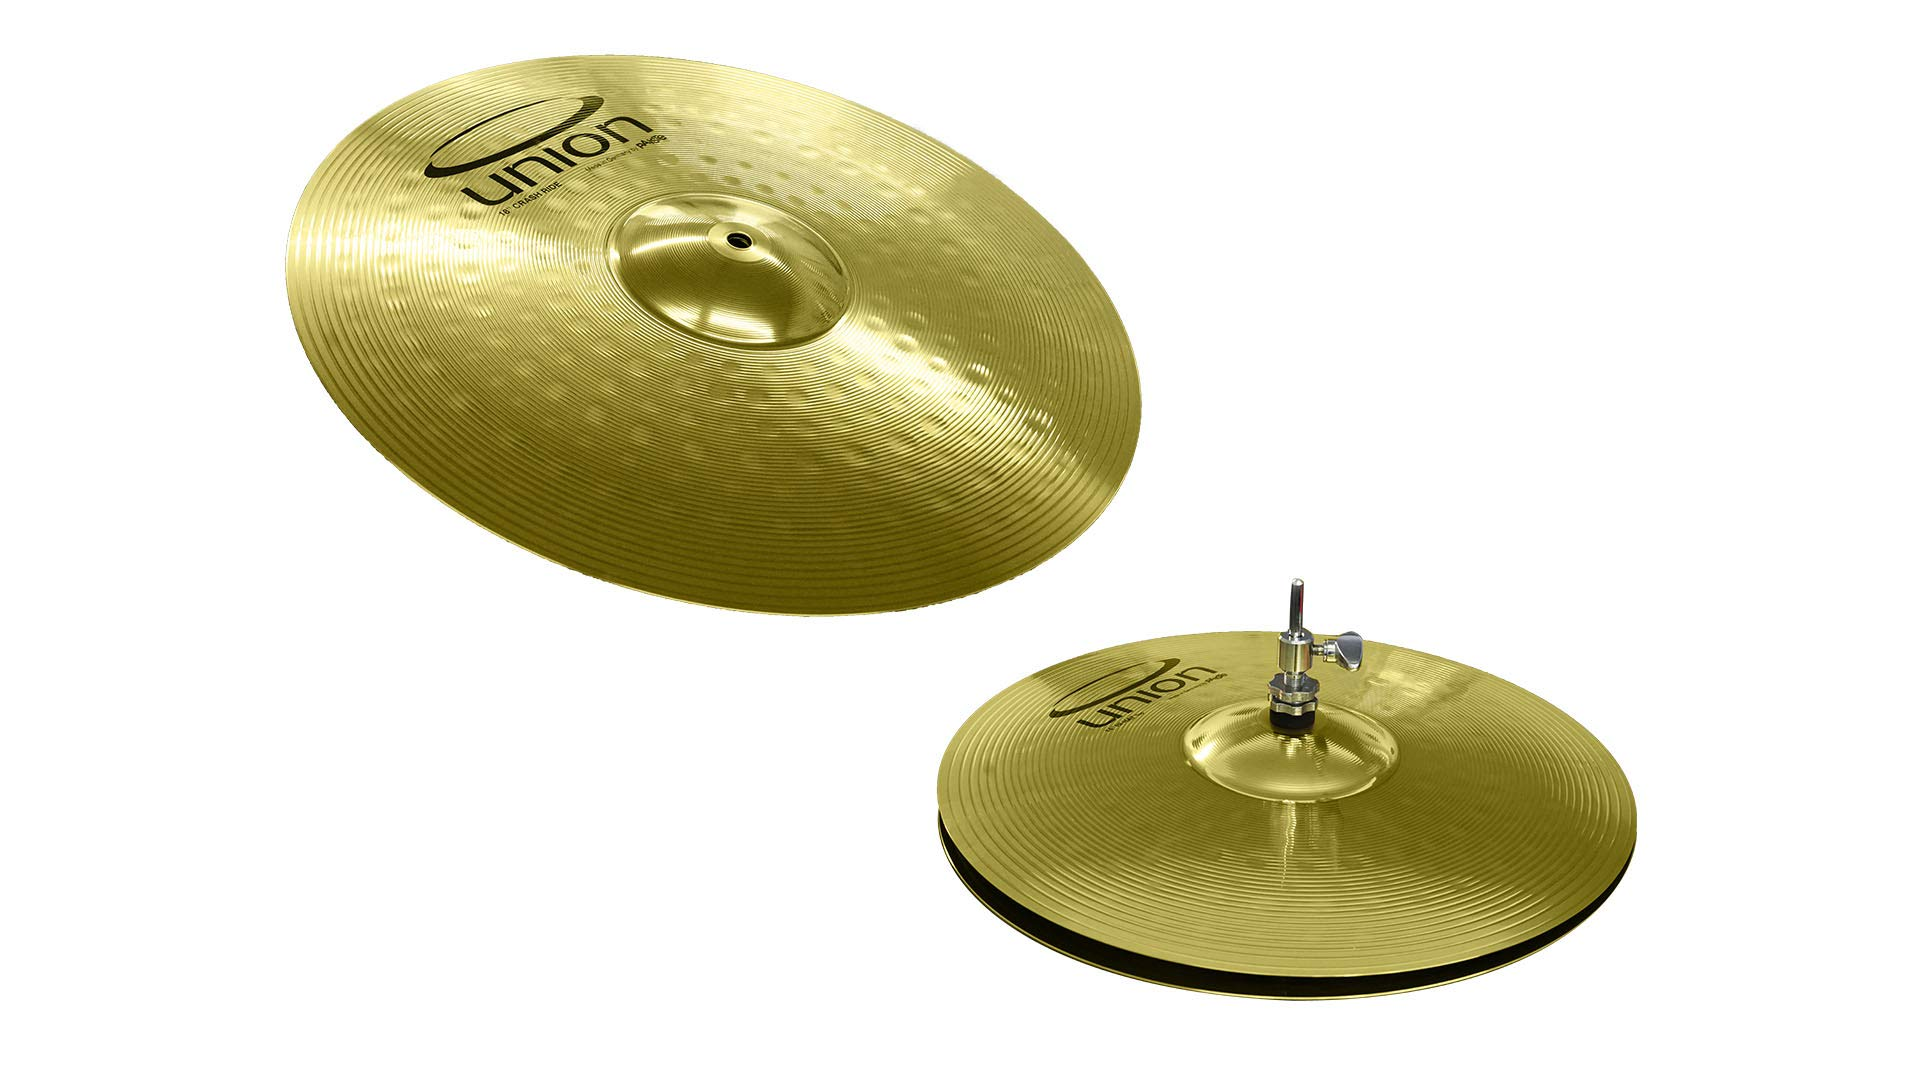 Union by Paiste 3-Piece Brass Cymbal Set - 14 inch Hi-Hats/18 inch Crash-Ride (OEMBM2KP) by Union